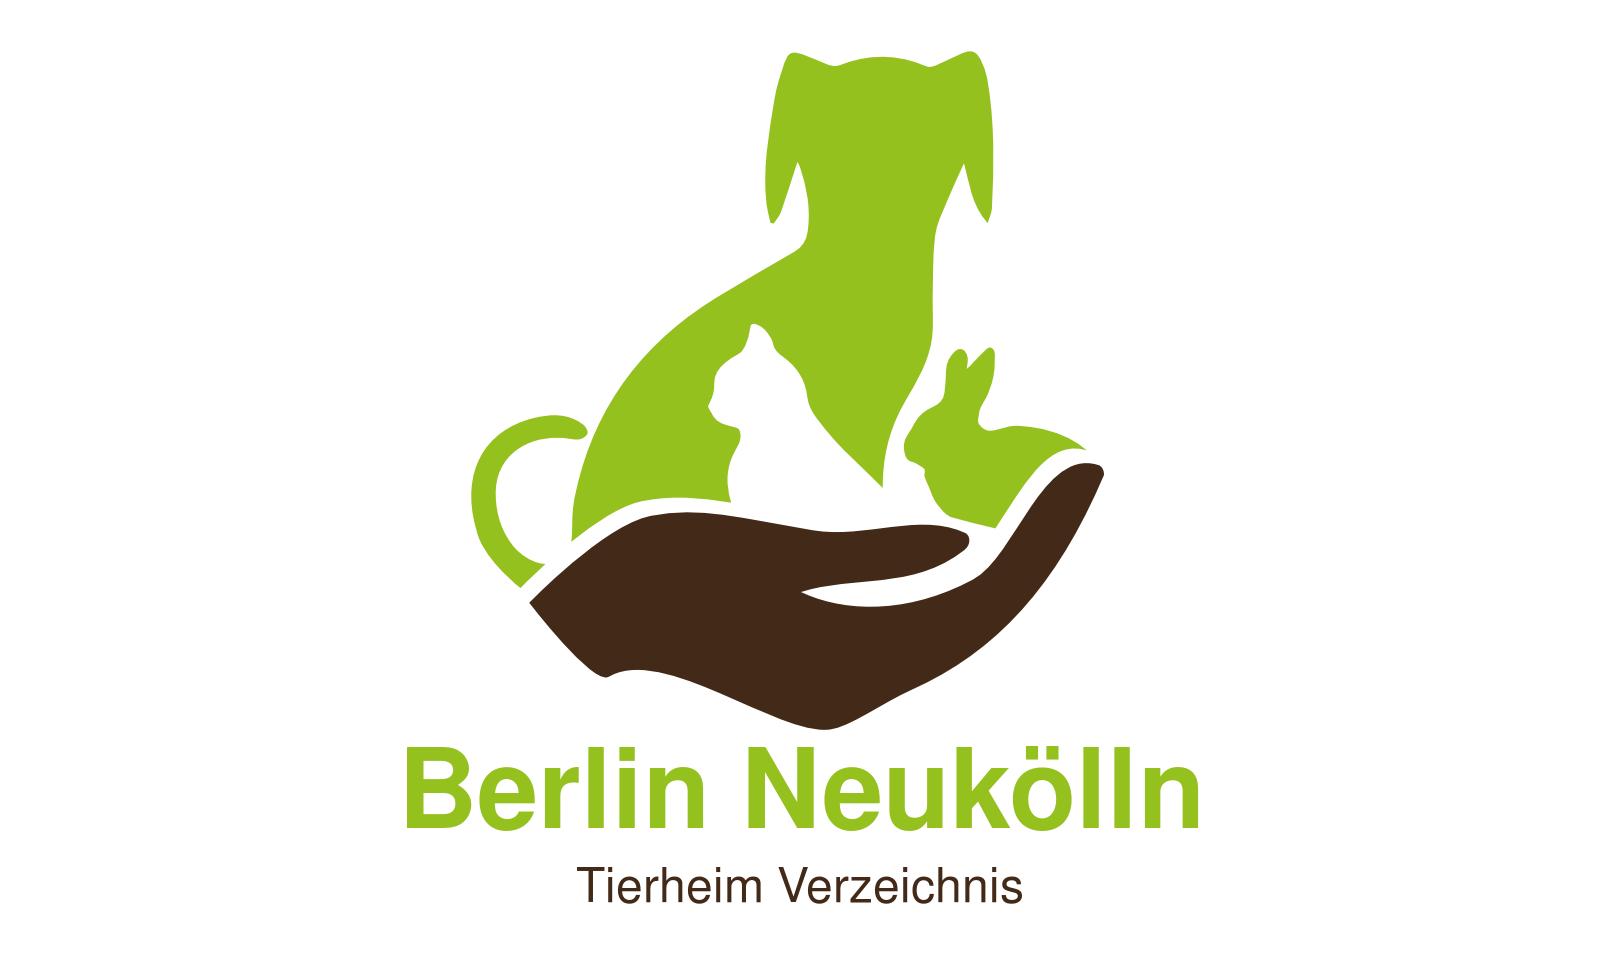 Tierheim Berlin Neukölln